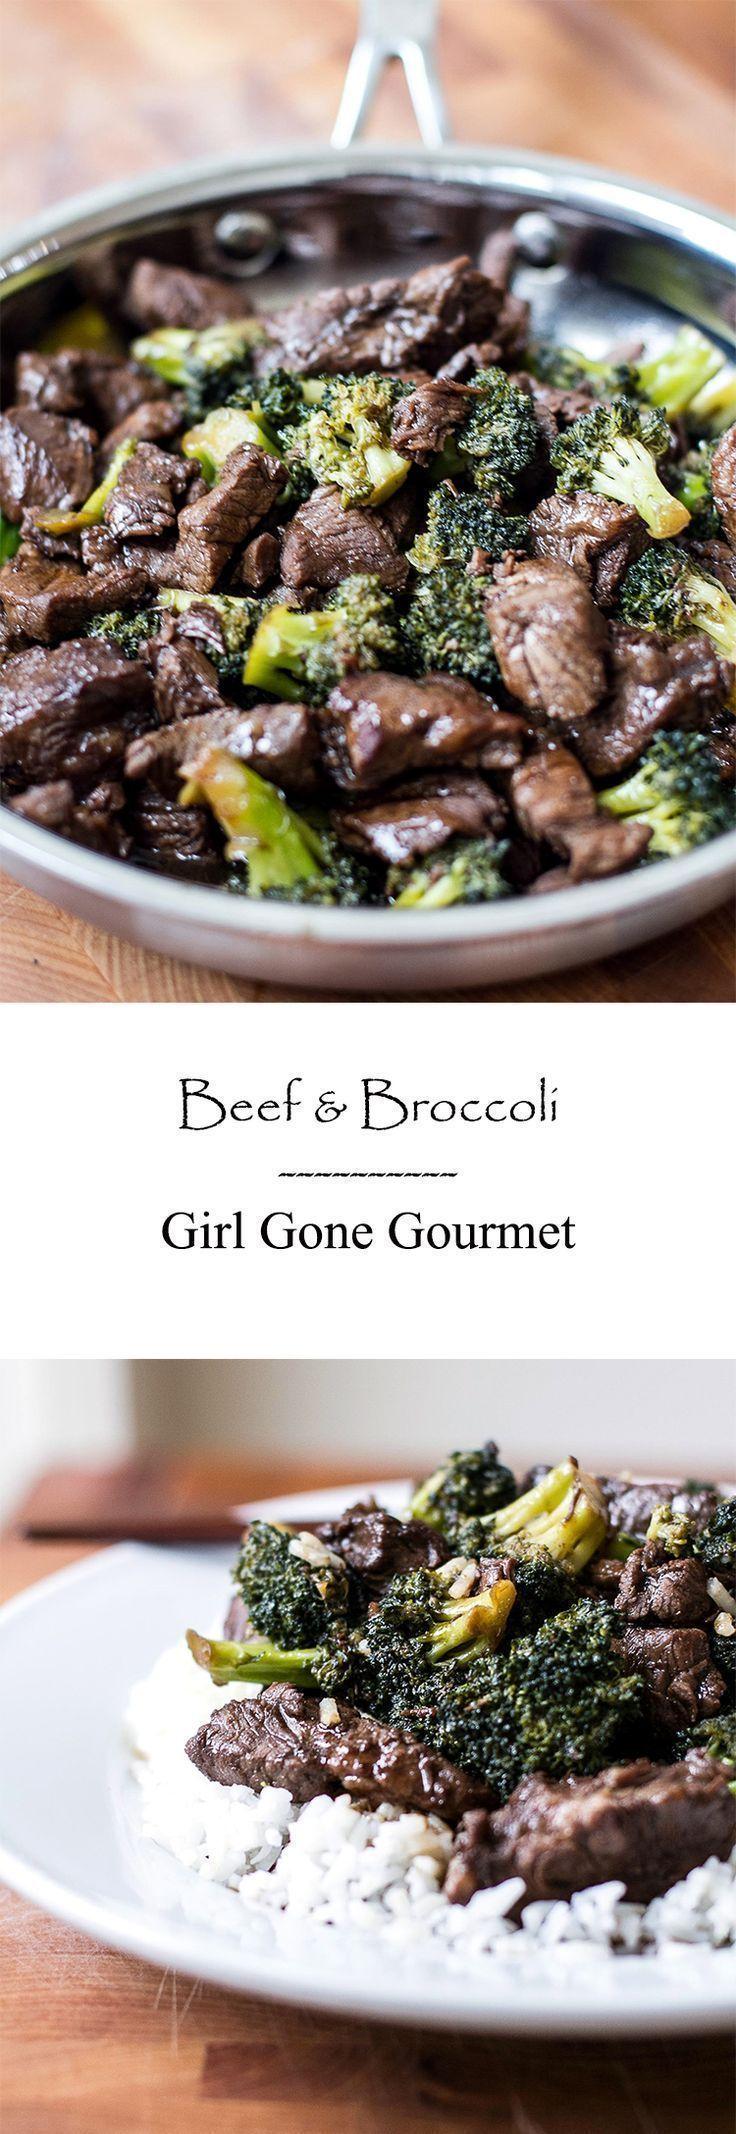 Easy beef & broccoli | girlgonegourmet.com